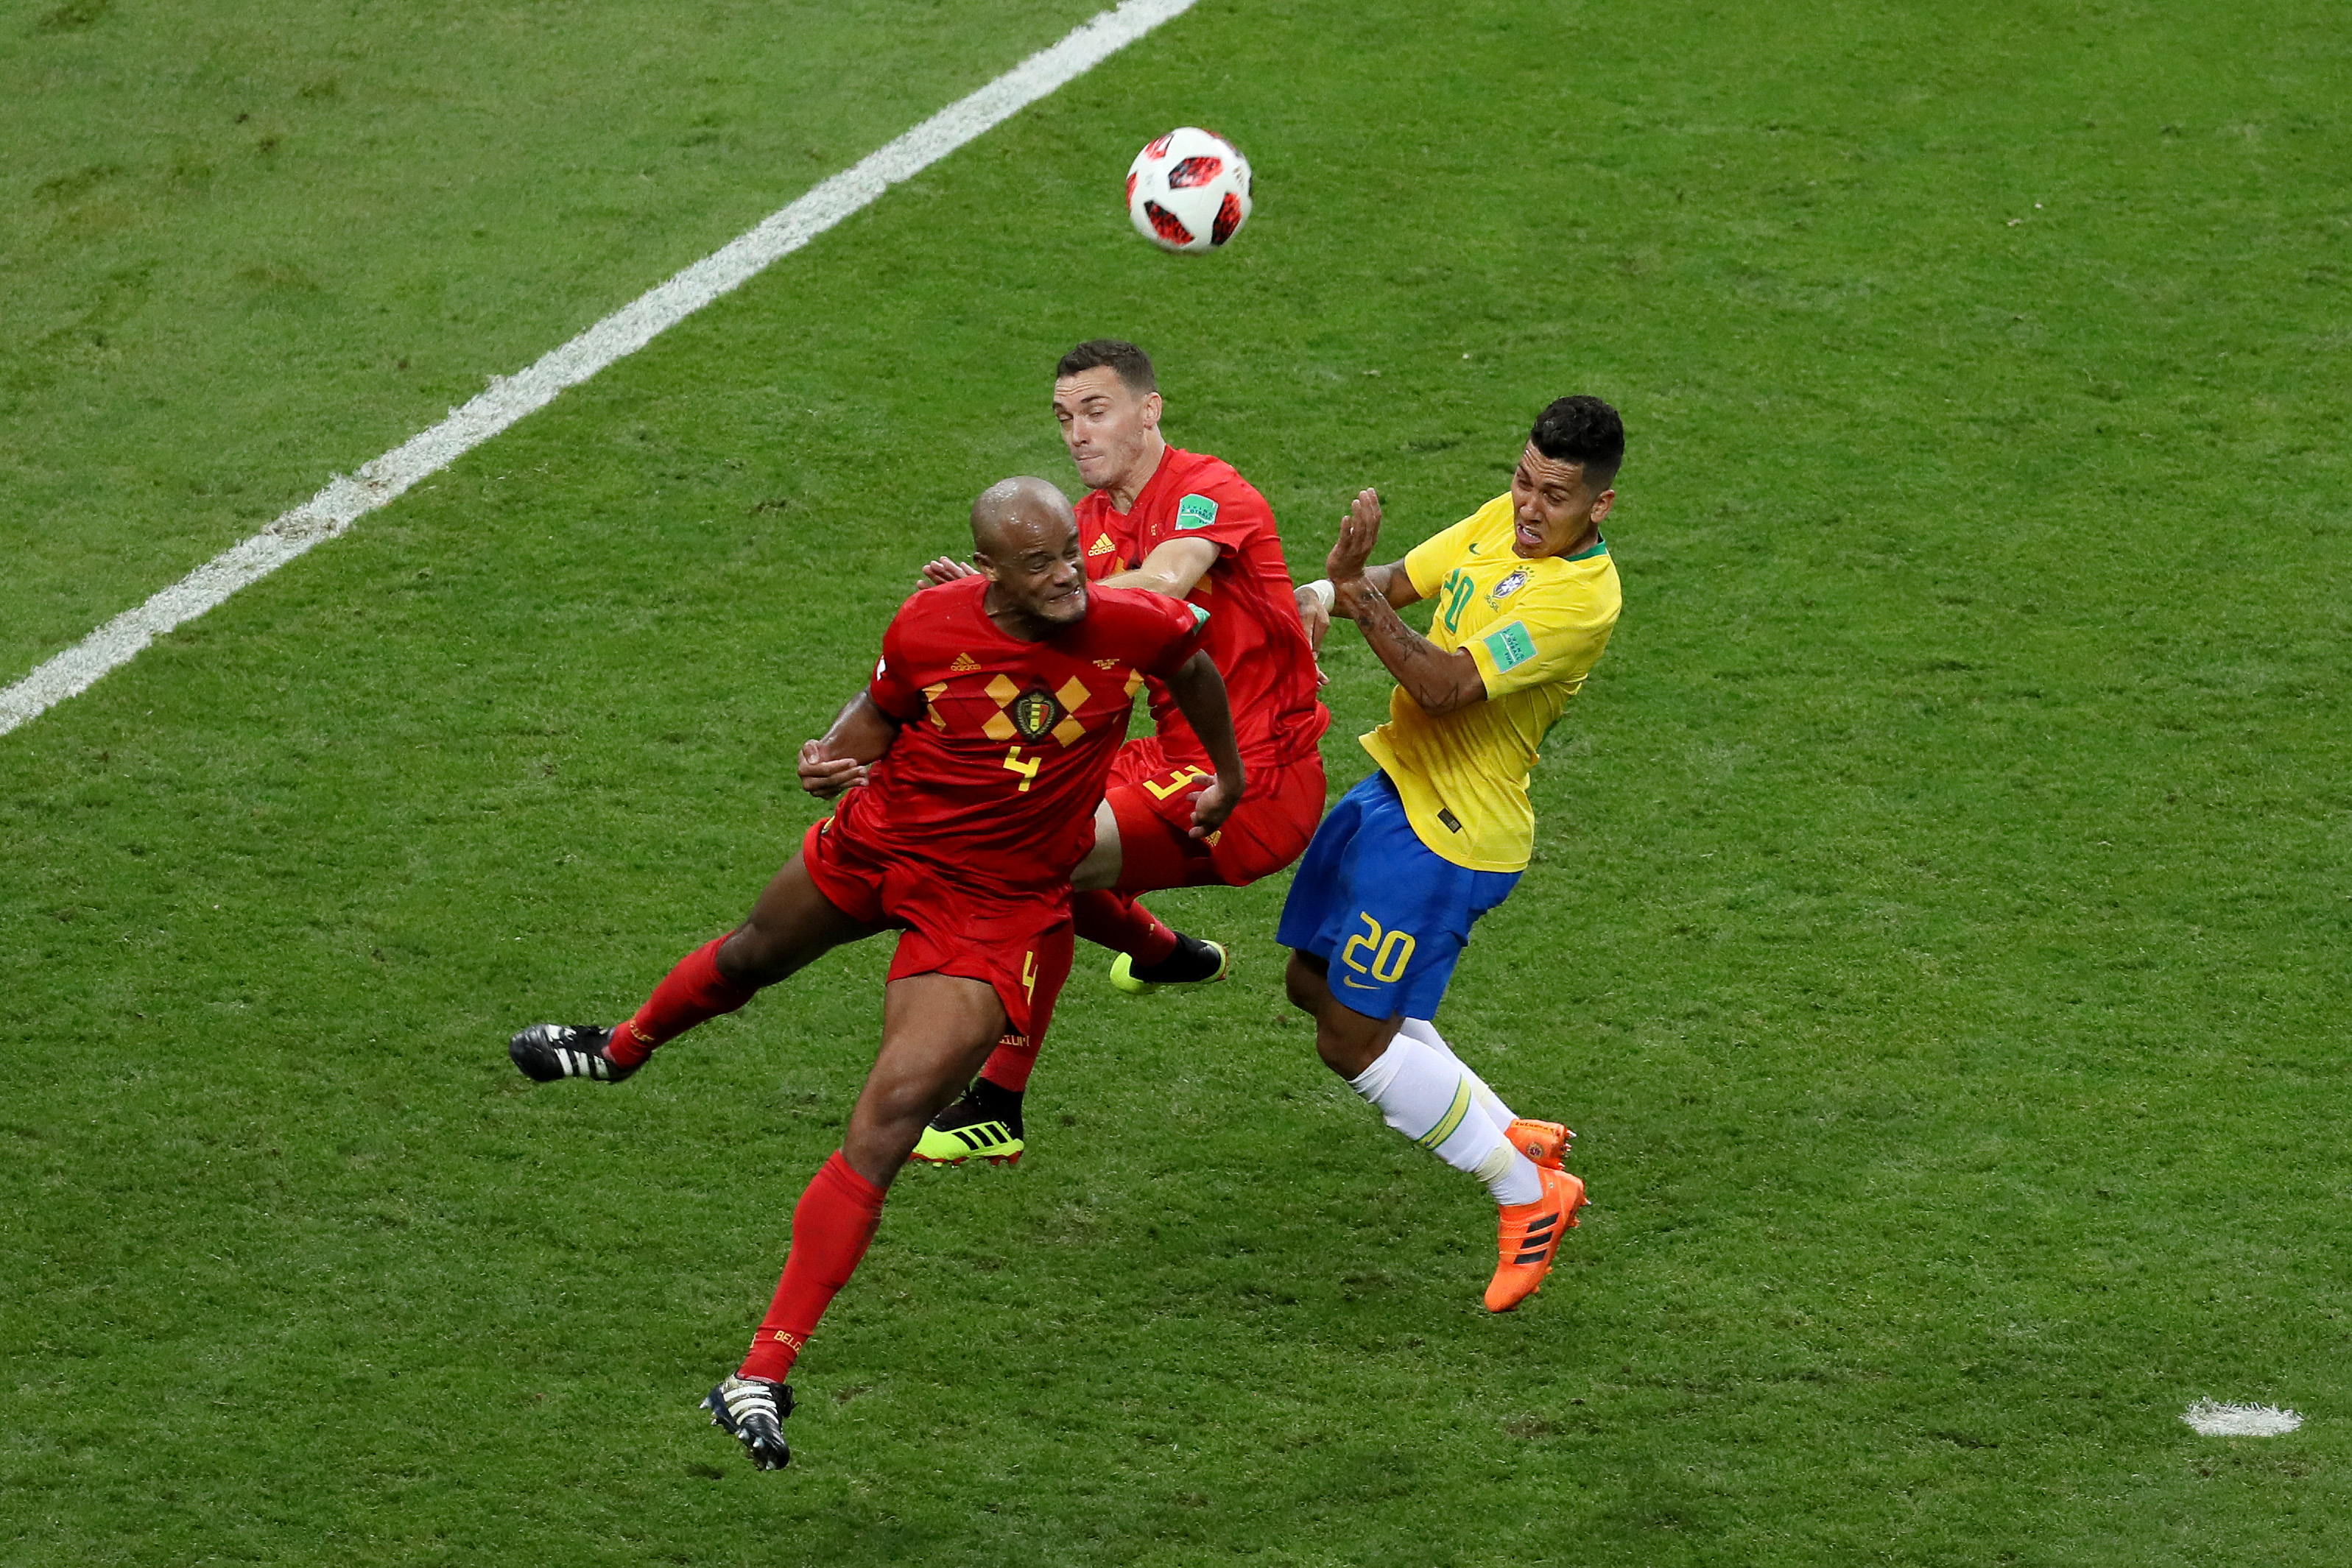 Vincent Kompany Thomas Vermaelen Roberto Firmino Brazil Belgium World Cup 07/06/18